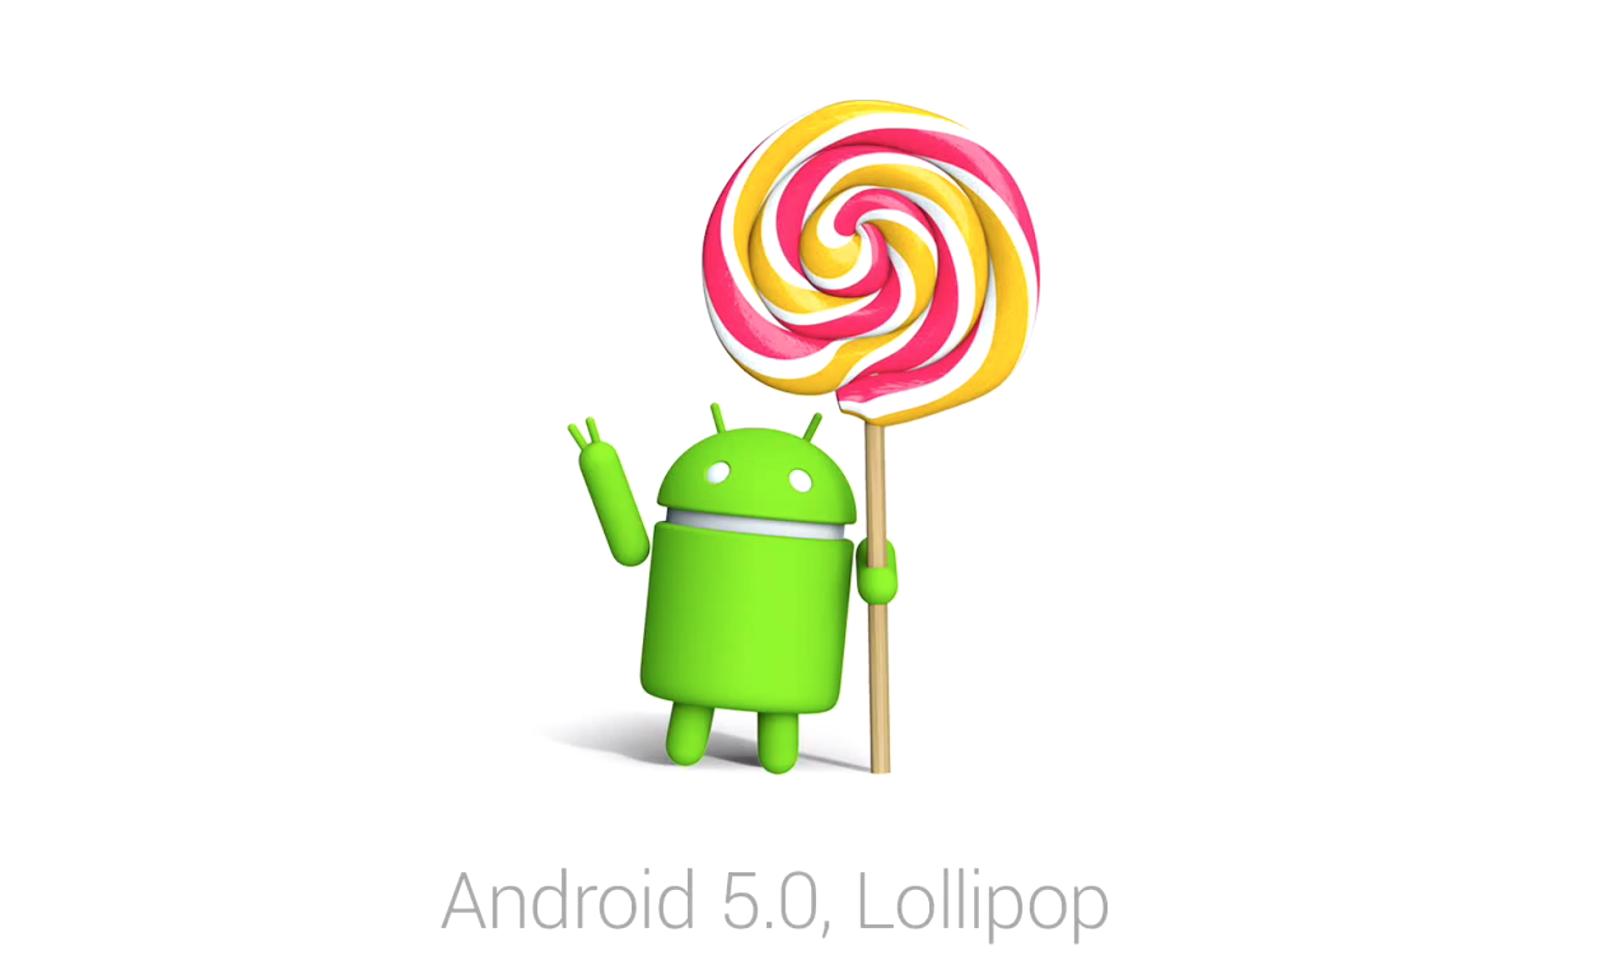 Kelebihan Android Lollipop 5.0